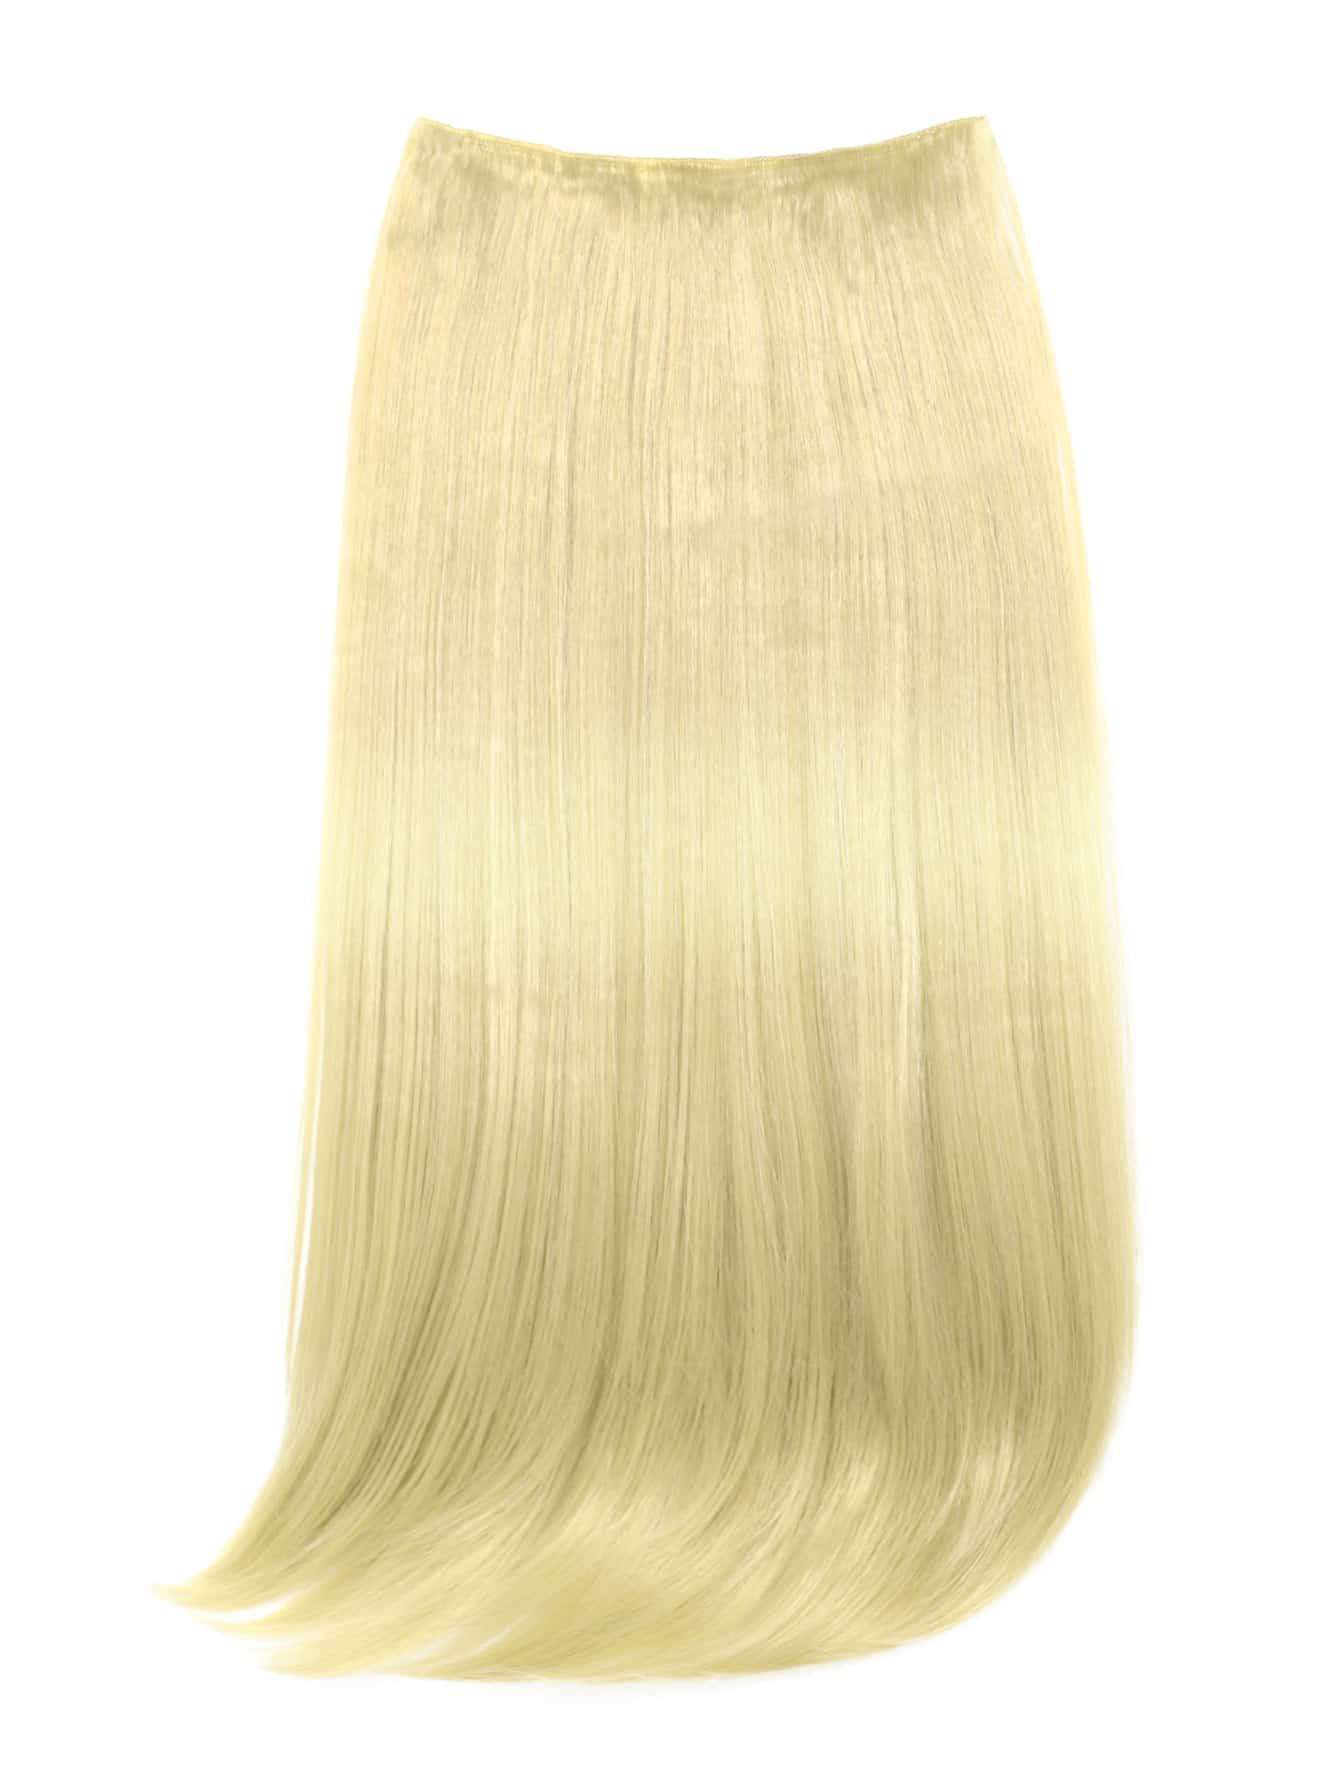 Купить со скидкой Straight Hair Weft With Clip